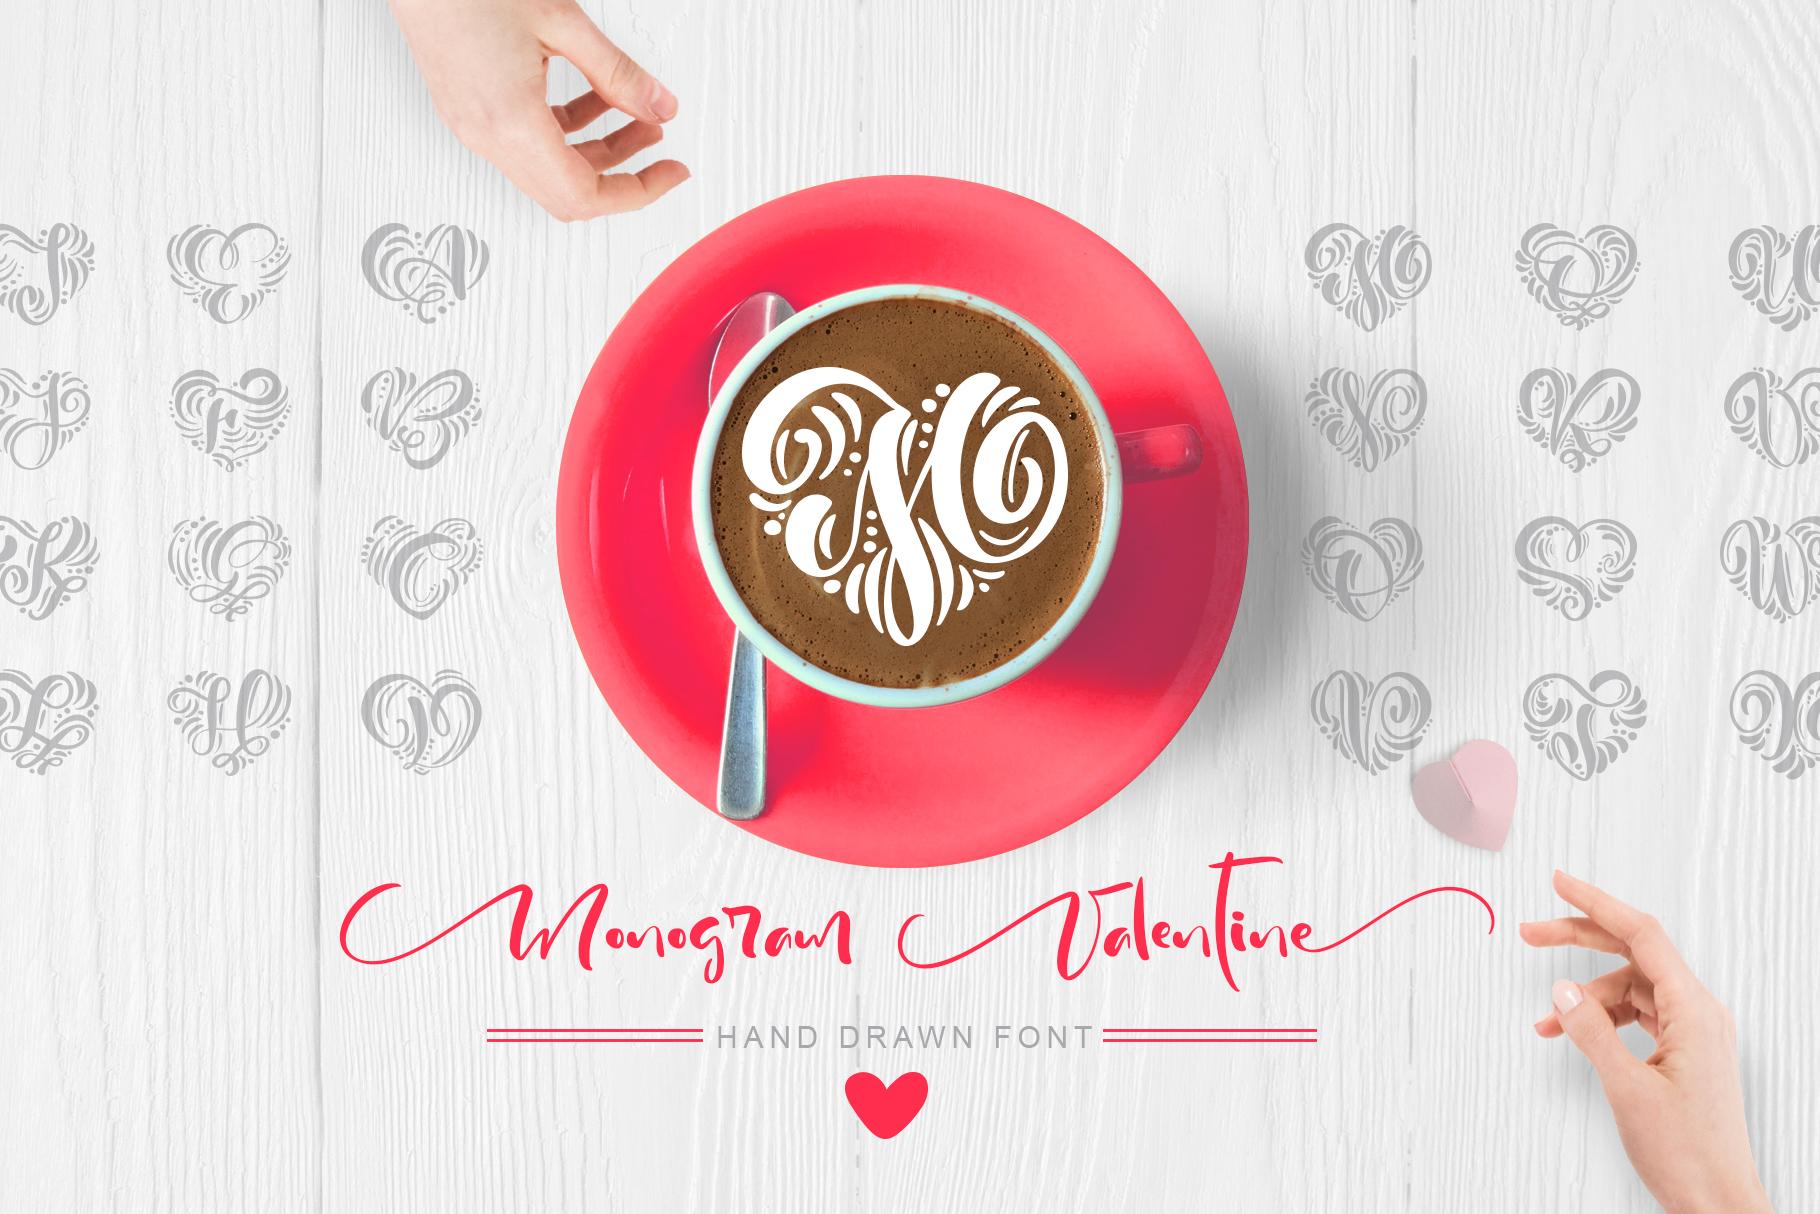 Monogram Valentine Font - title01